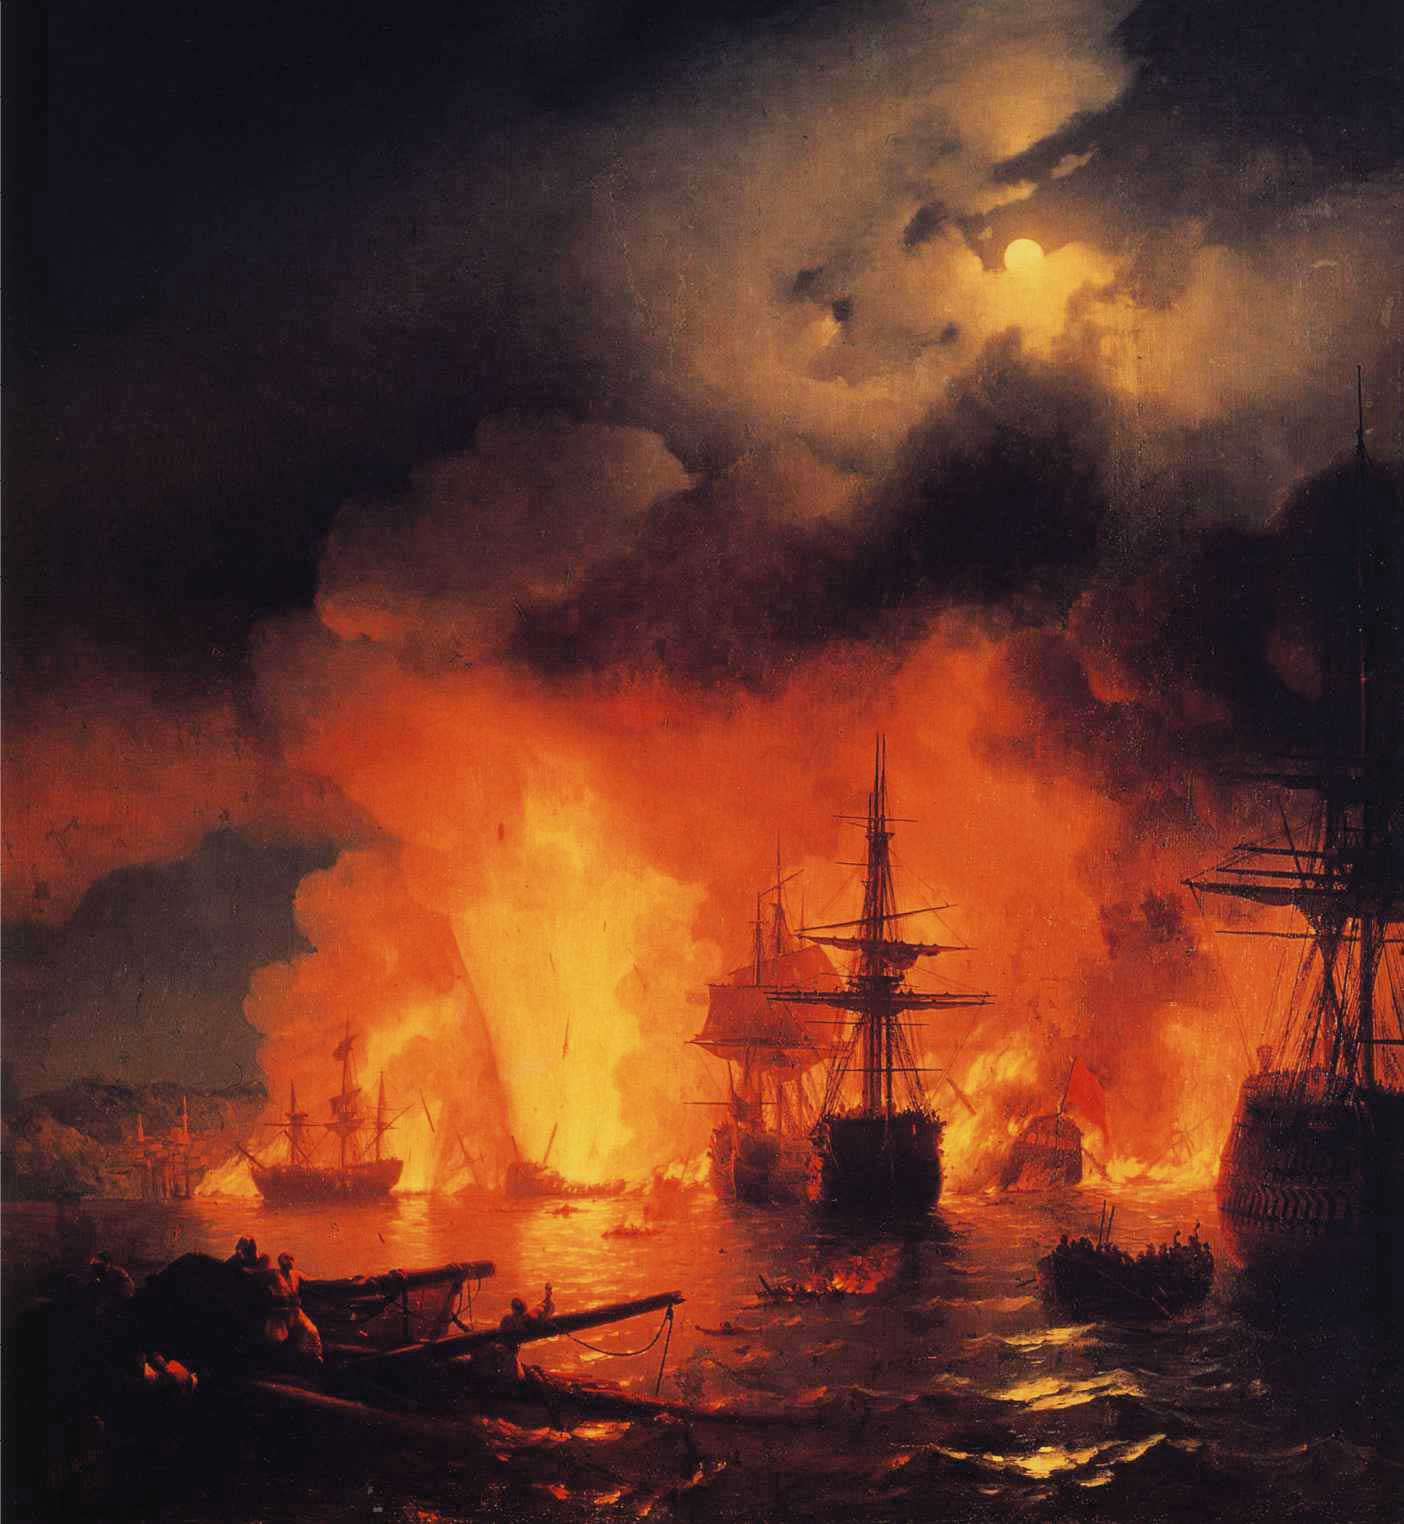 Battle of Cesme at Night :: Ivan Constantinovich Aivazovsky - Sea landscapes with ships ôîòî